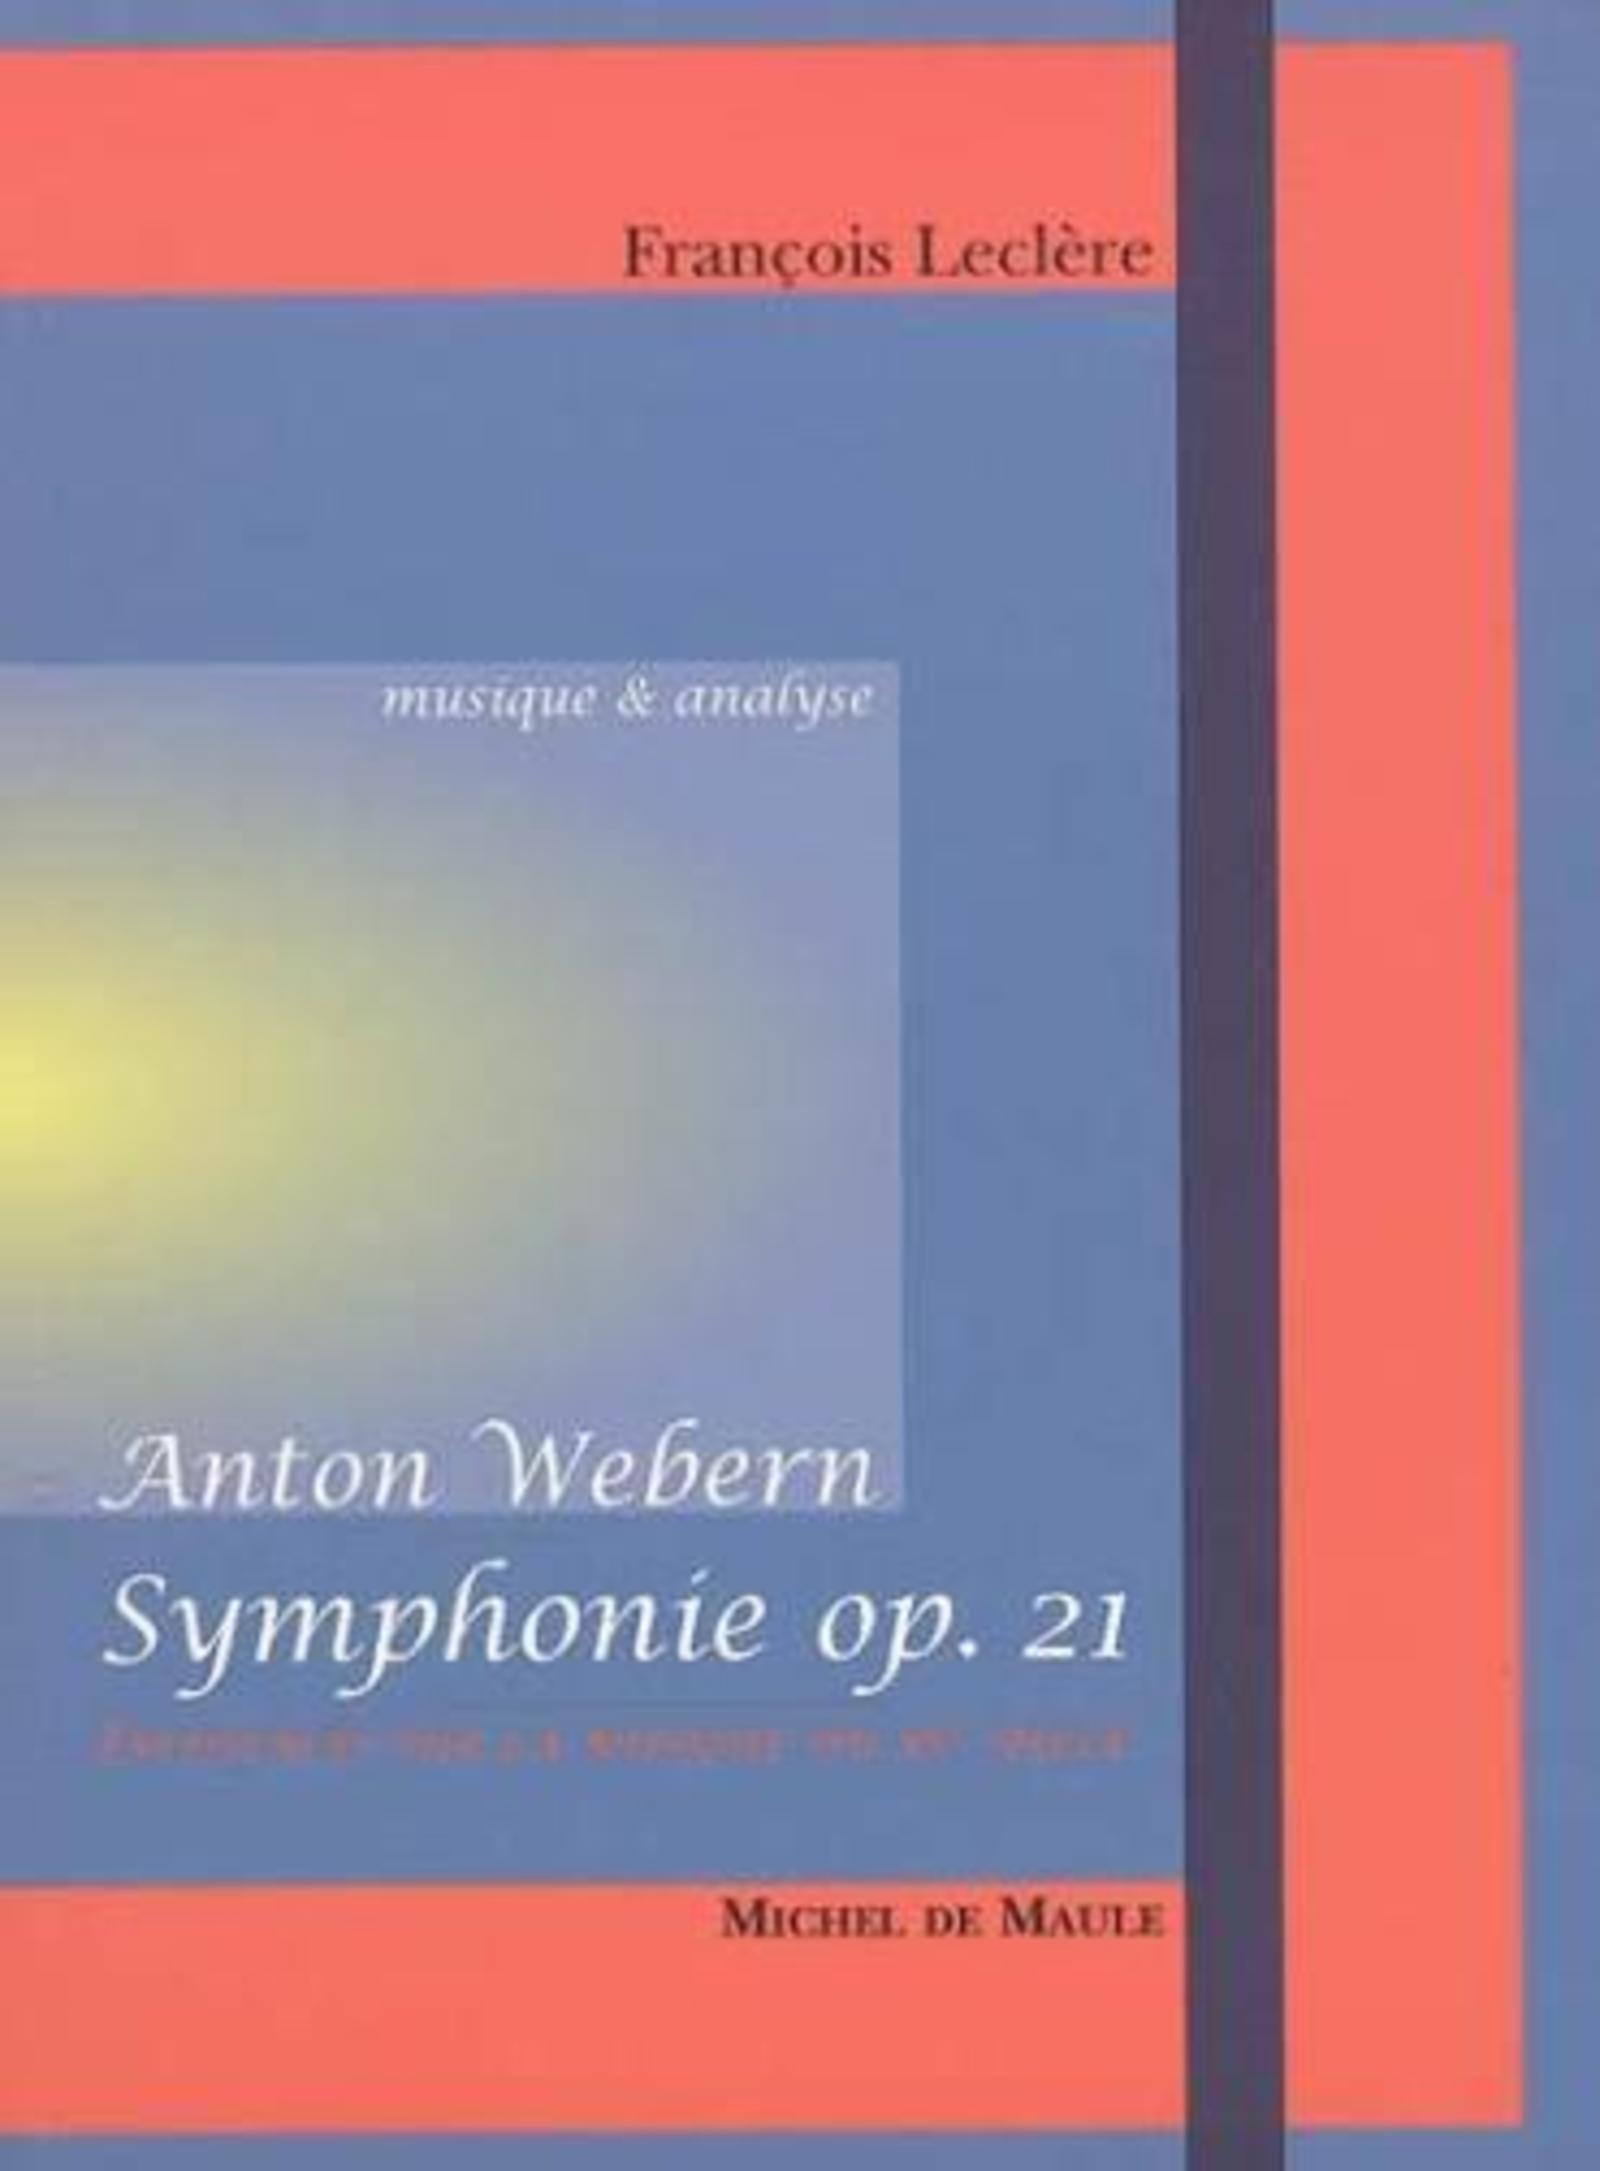 """SYMPHONIE OPUS 21"" D'ANTON WEBERN"